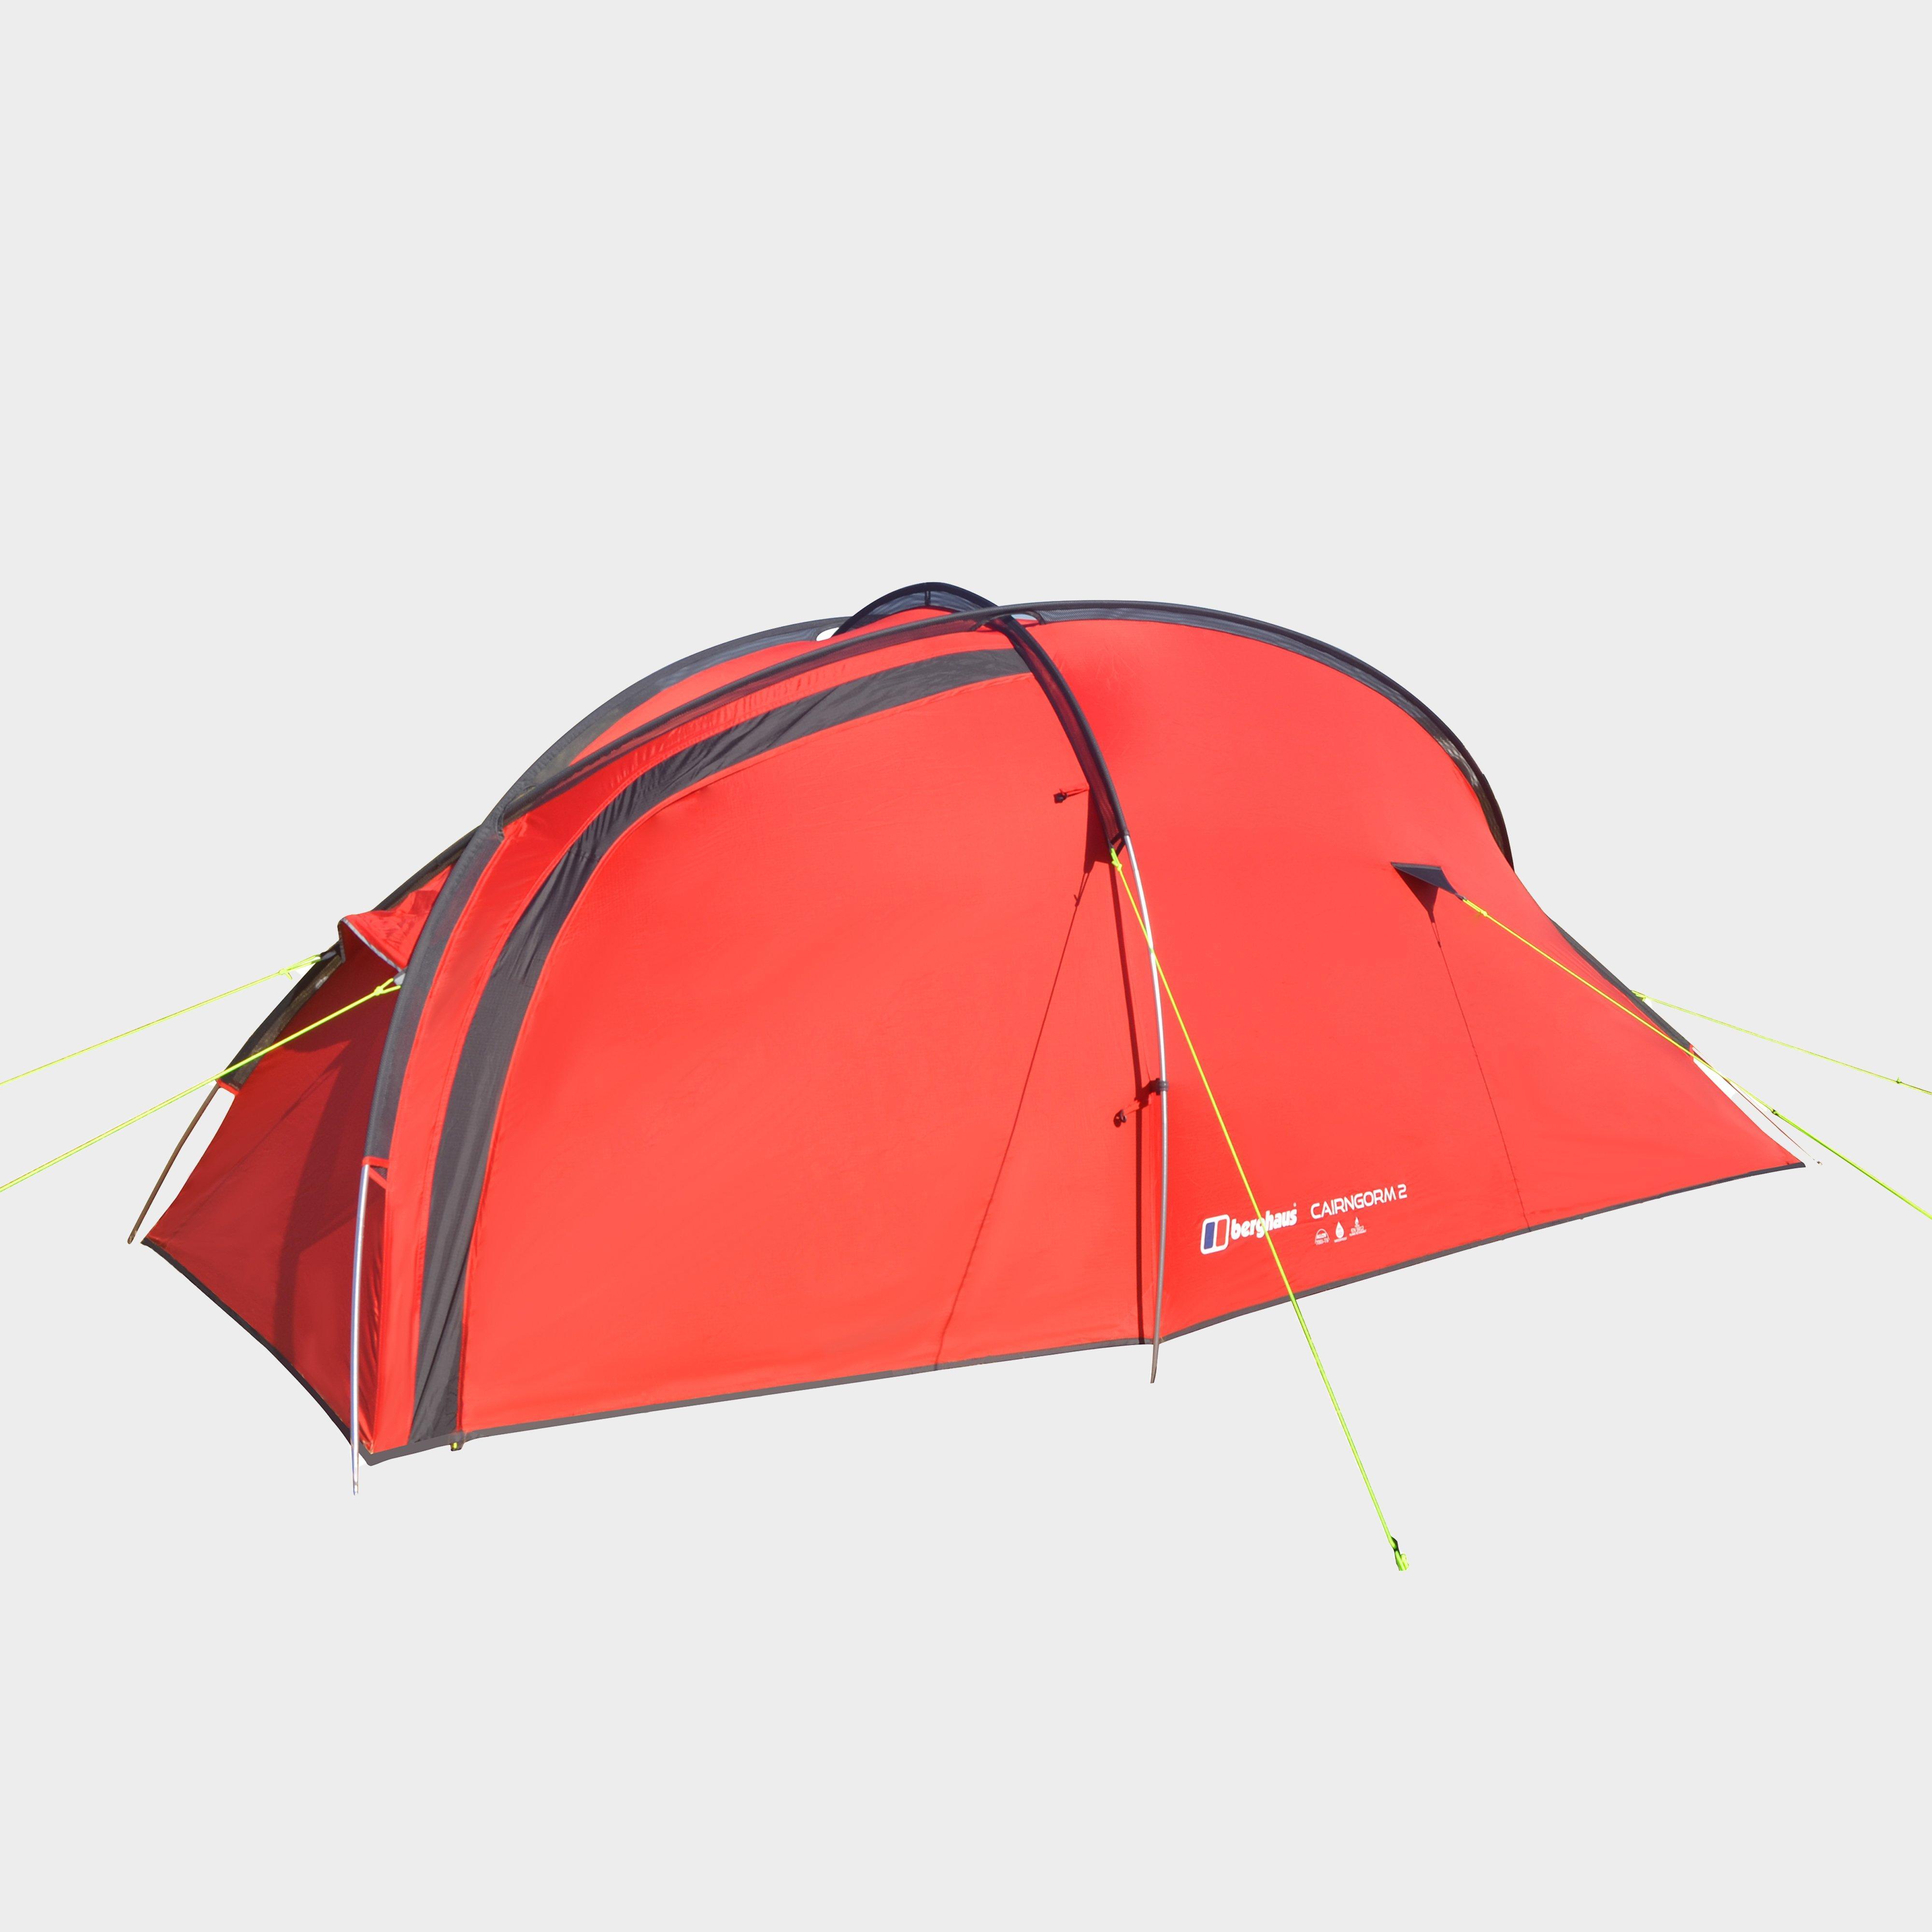 Berghaus Berghaus Cairngorm 2 Tent - Red, Red